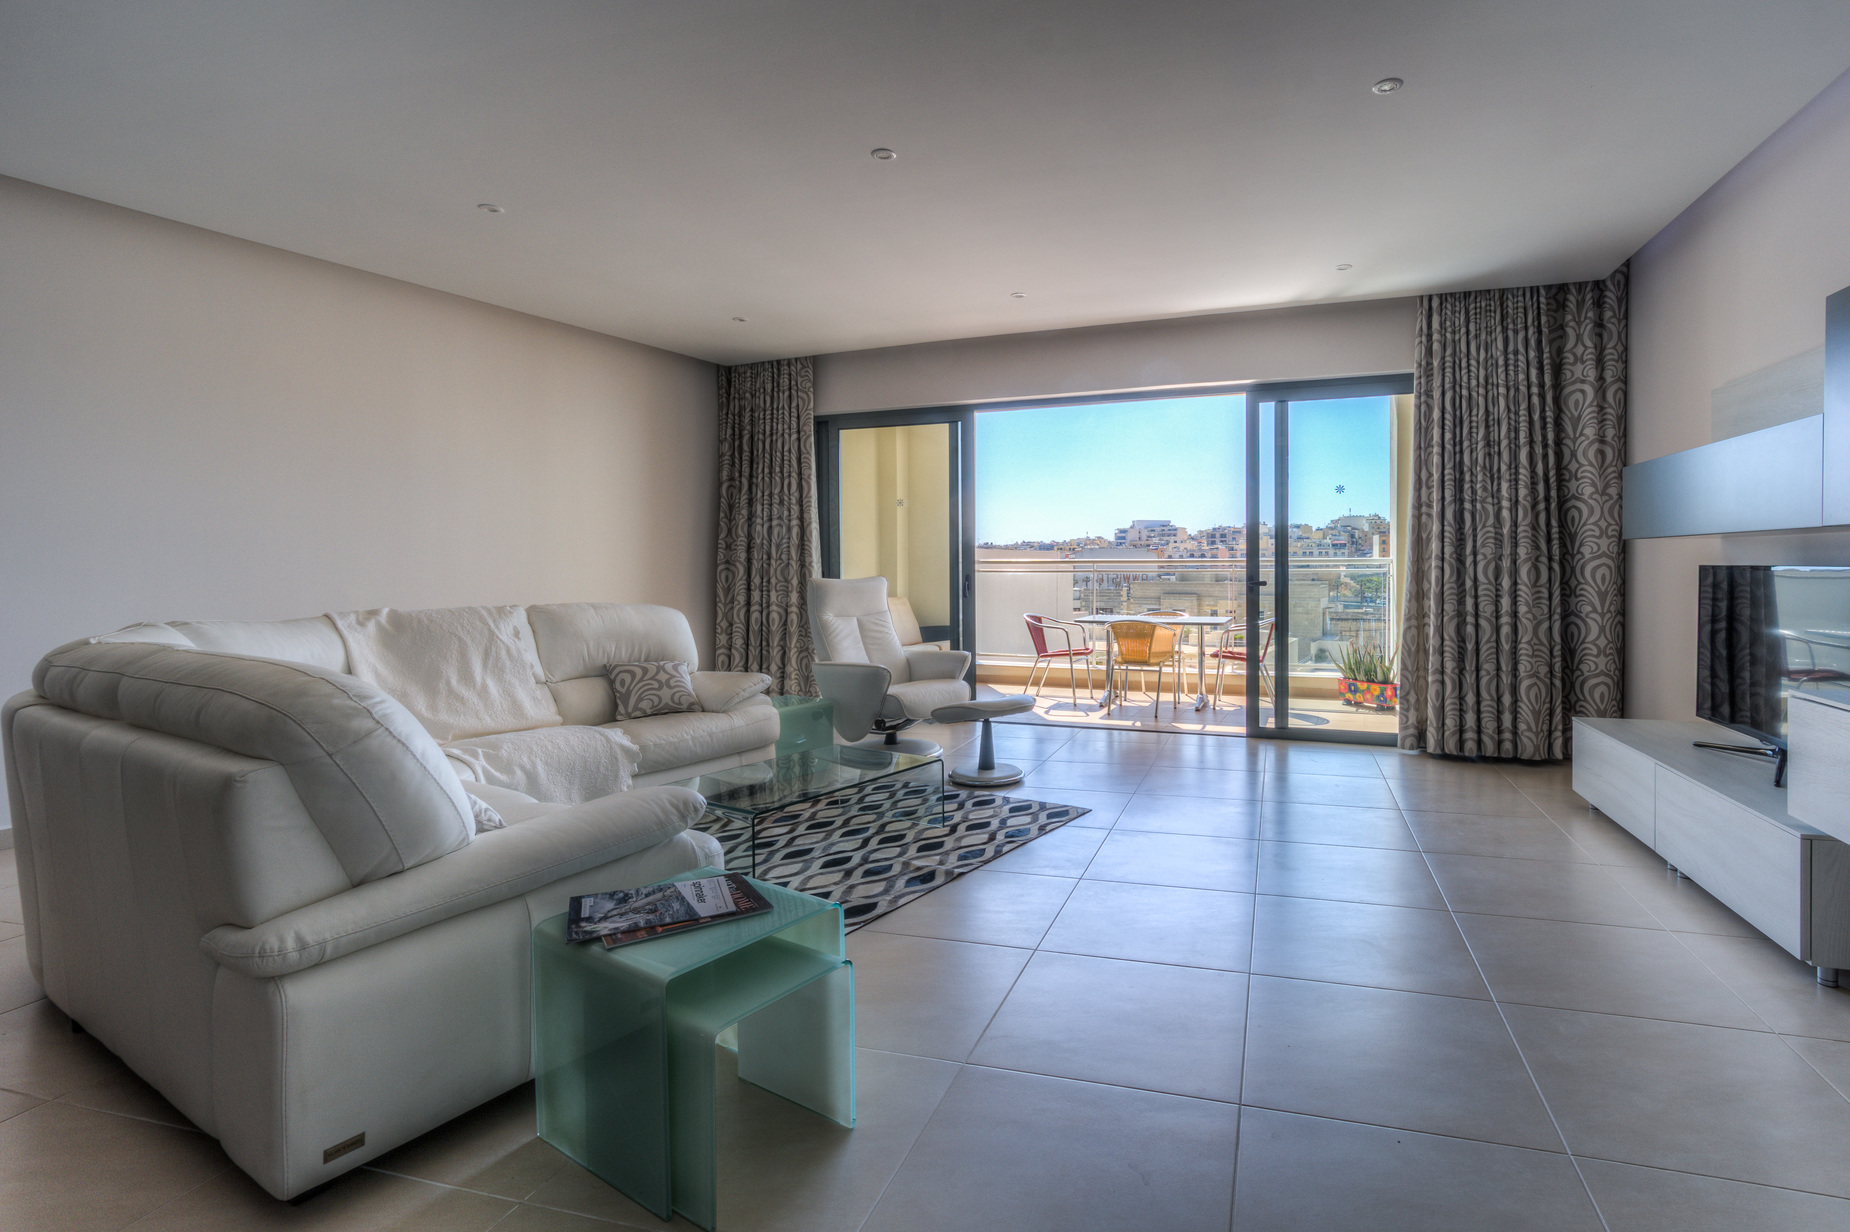 2 bed Apartment For Rent in Marsascala, Marsascala - thumb 7